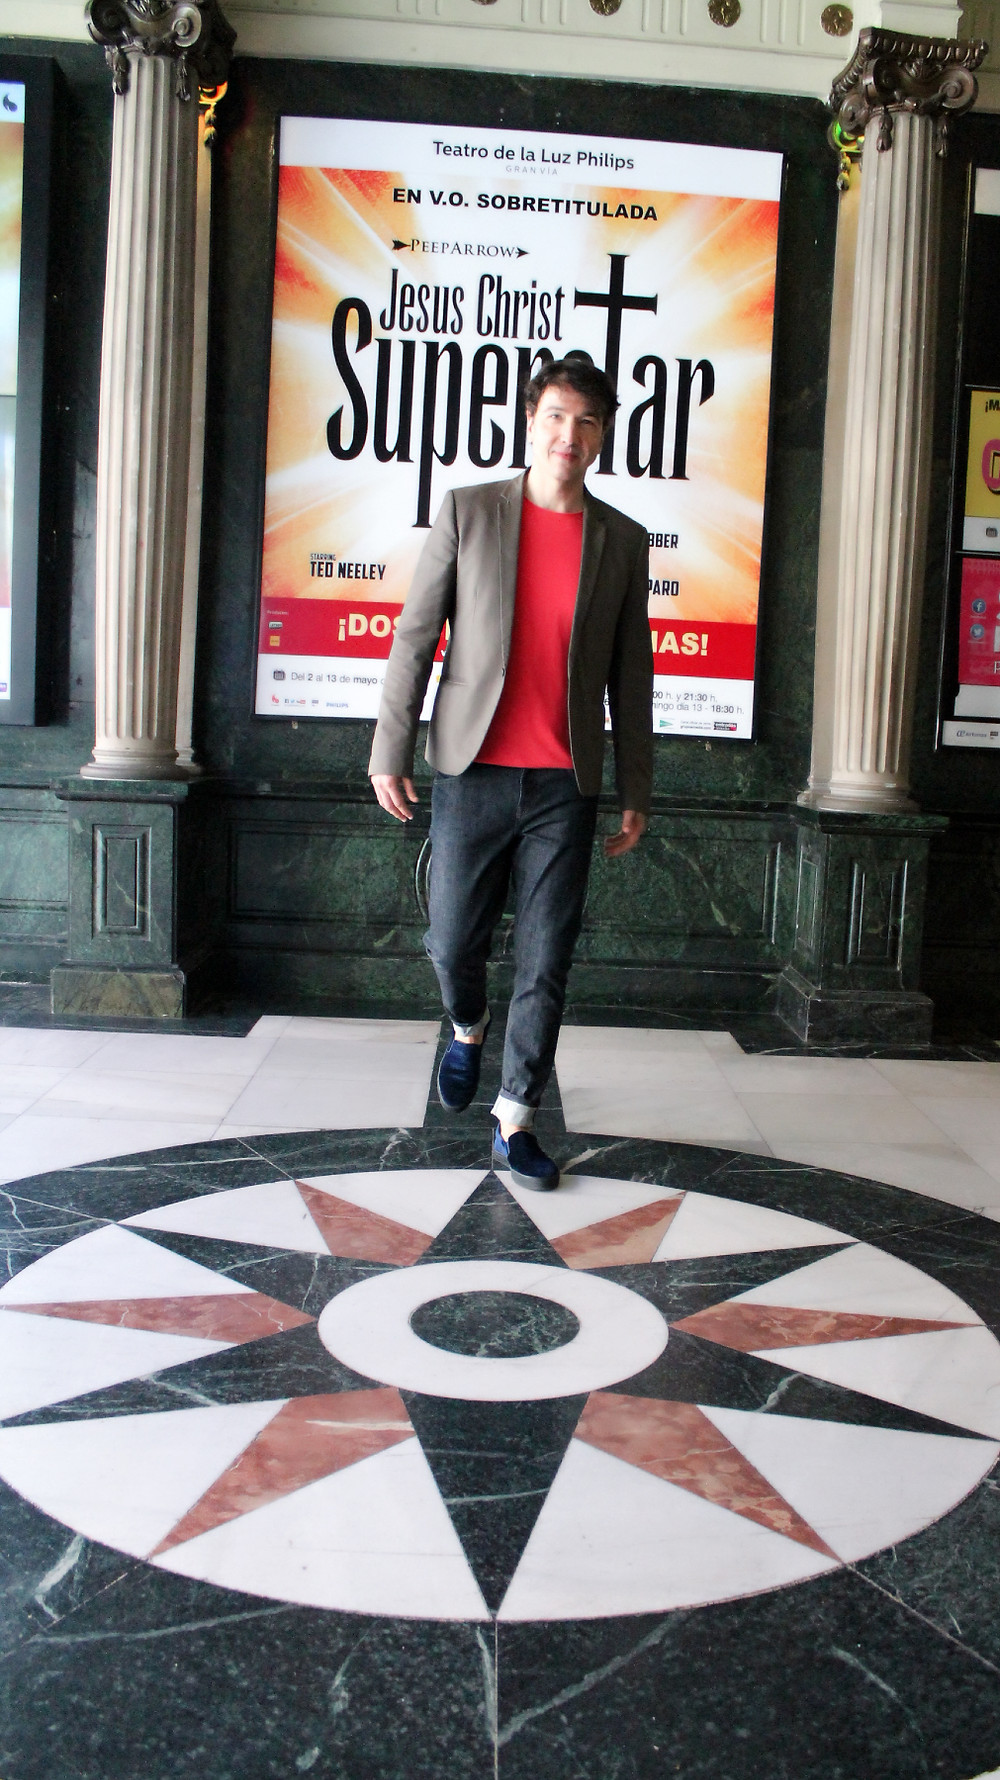 The trendy Man en el musical Jesus Christ Superstar